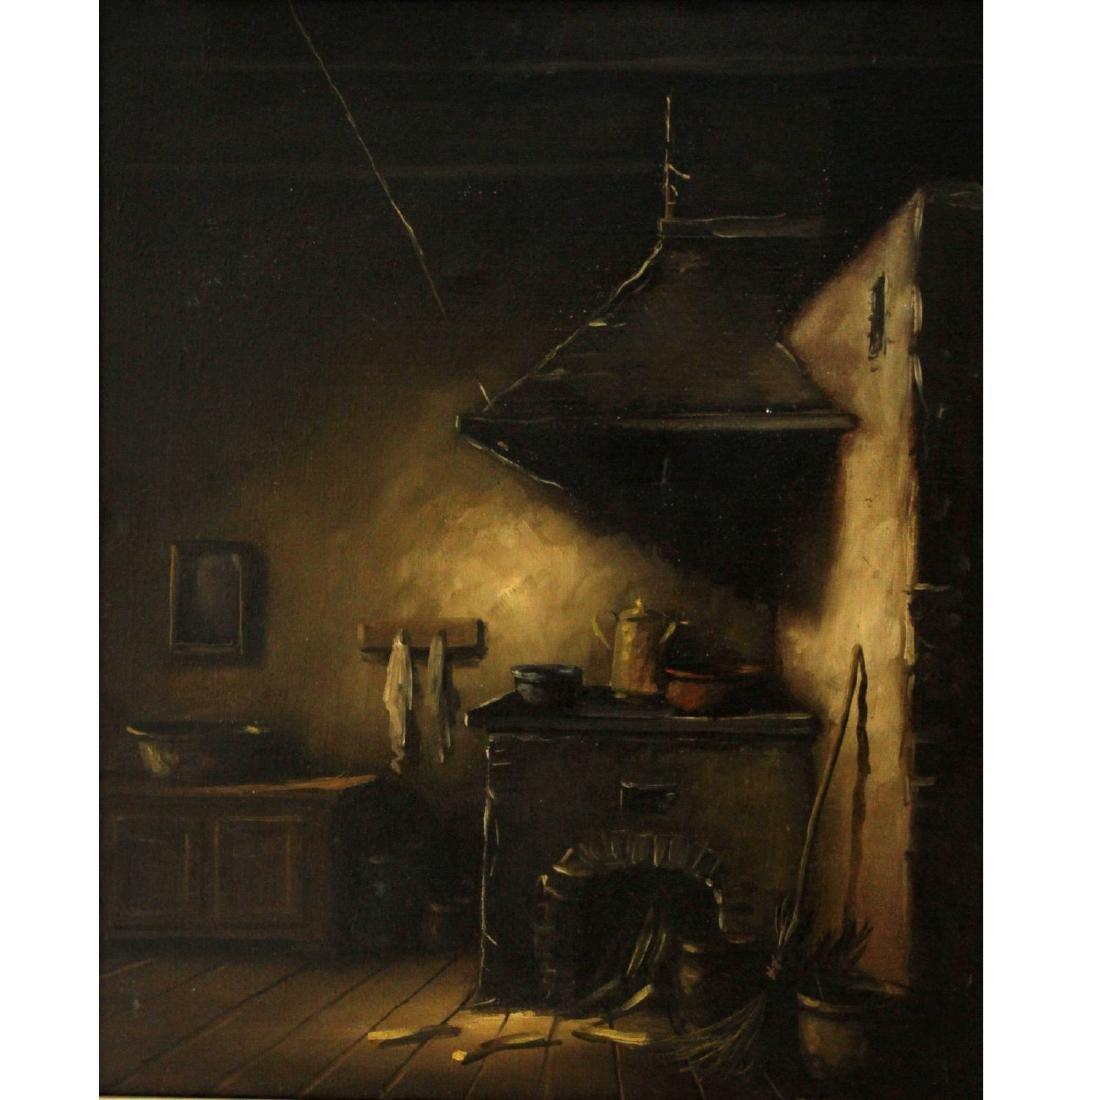 Jaroslaw Wojtkowiak (Poland, b.1952) - Kitchen, Oil on